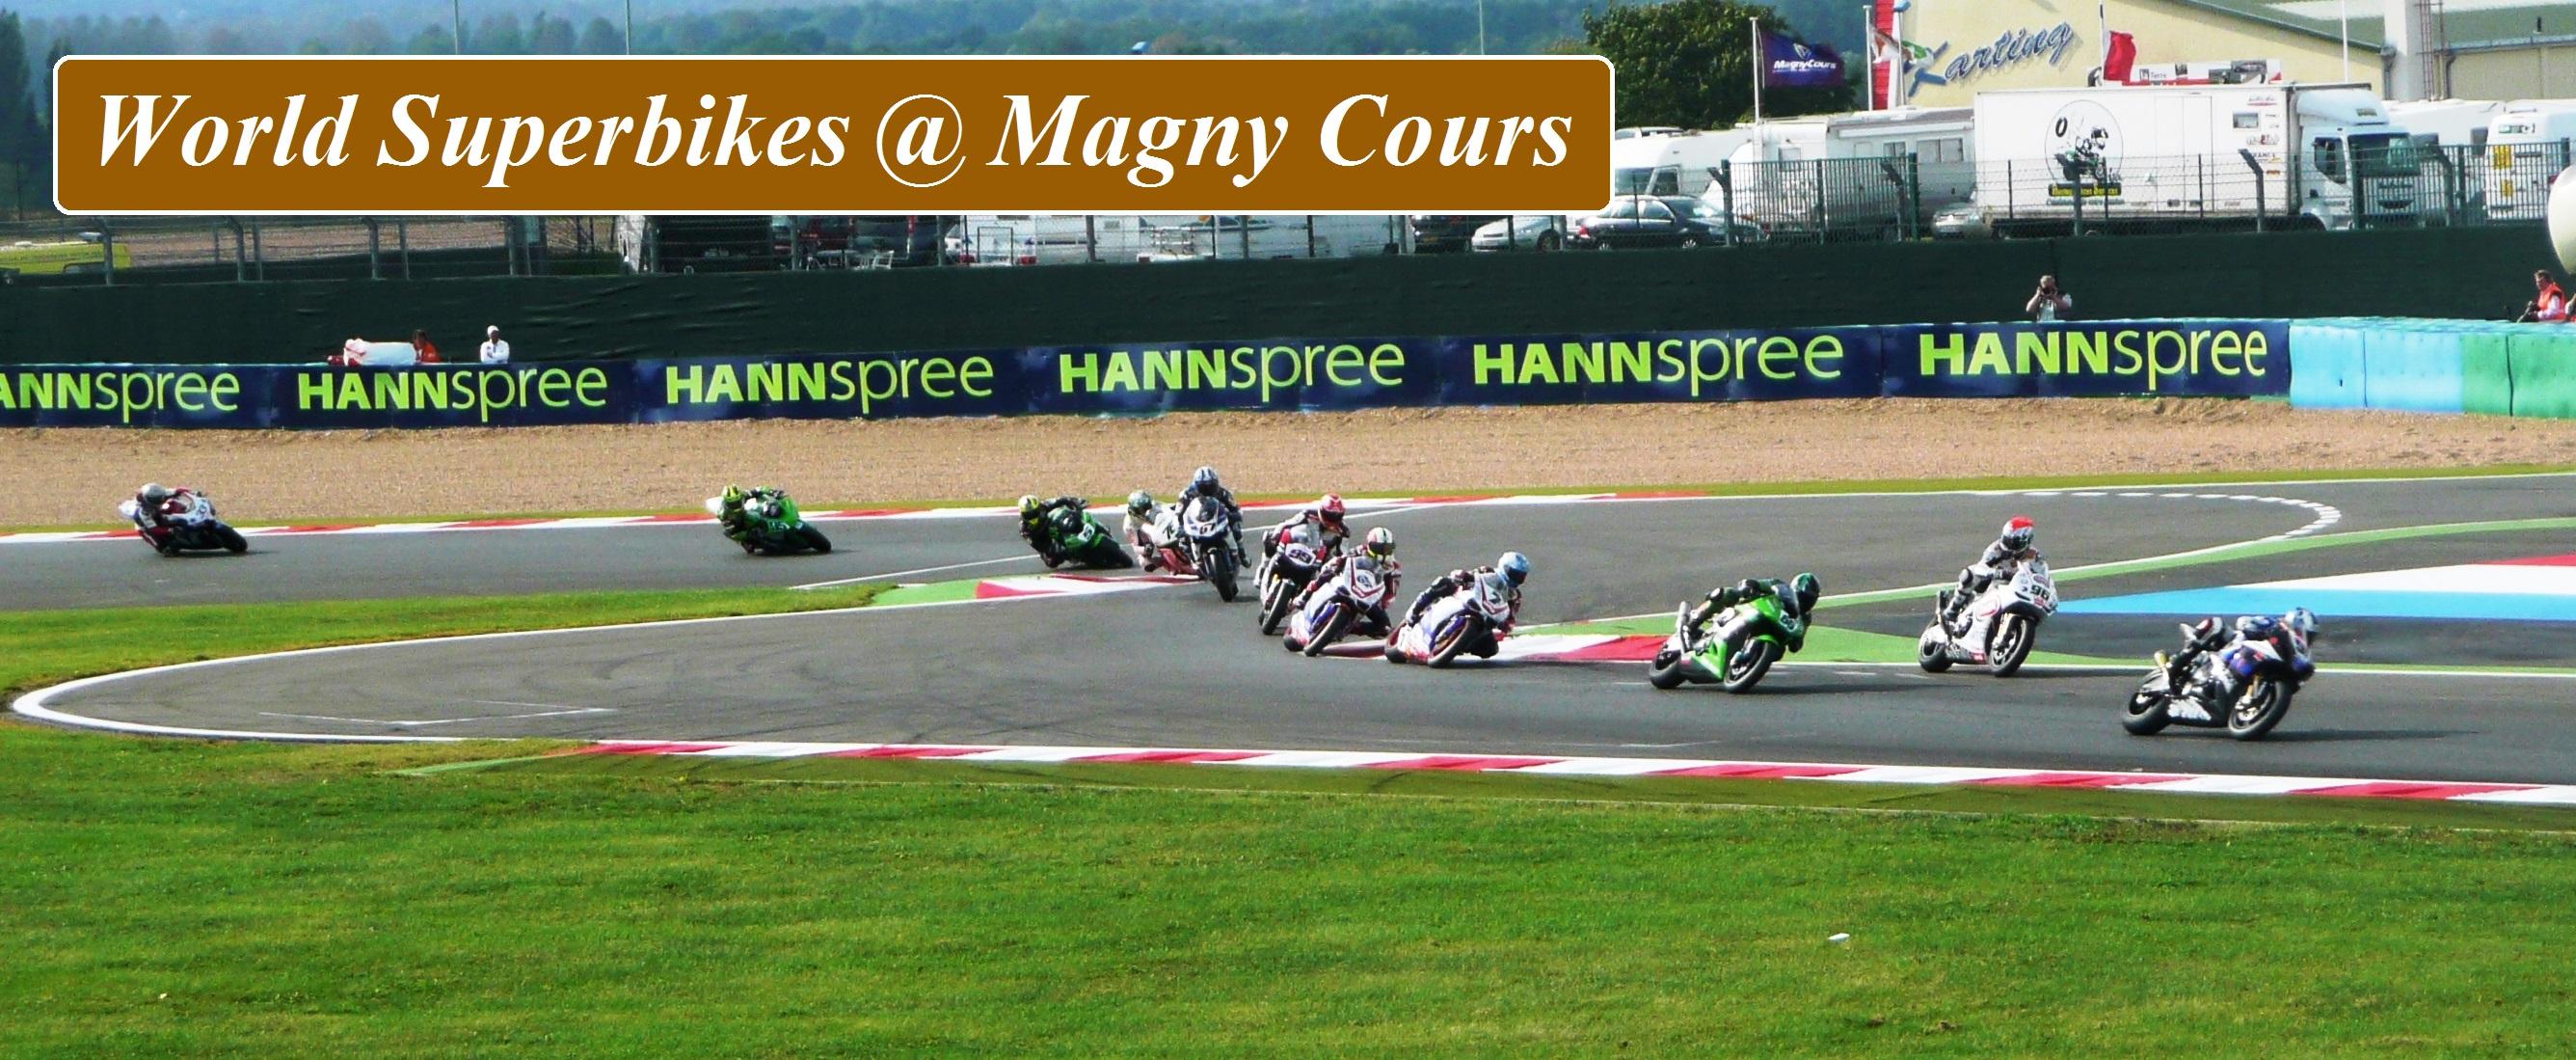 1j WSB Magny Cours cropped original text